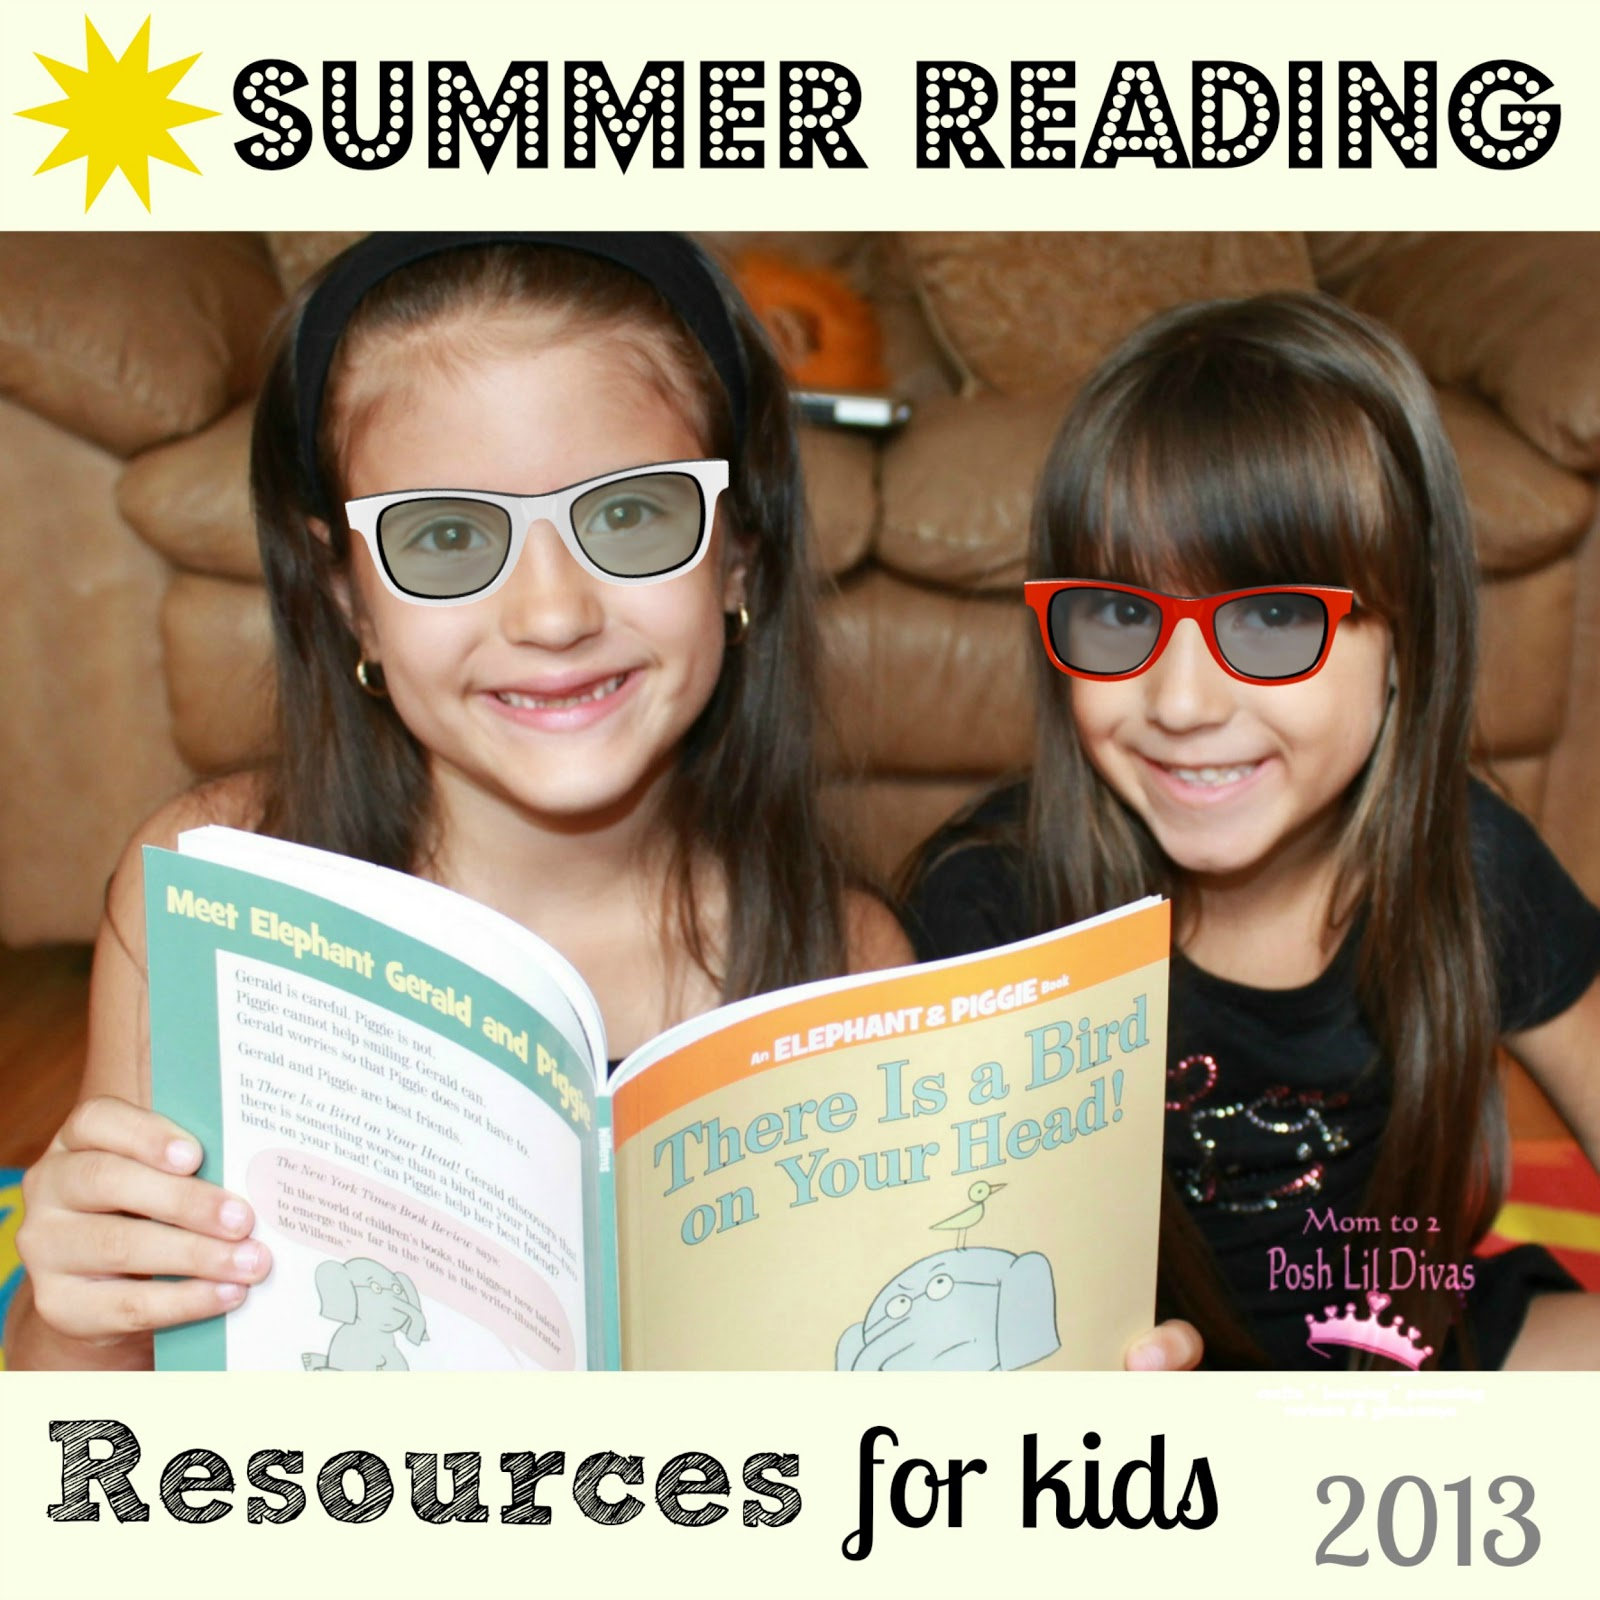 Worksheet Best Online Reading Programs best online reading programs for kids scalien mikyu free worksheet